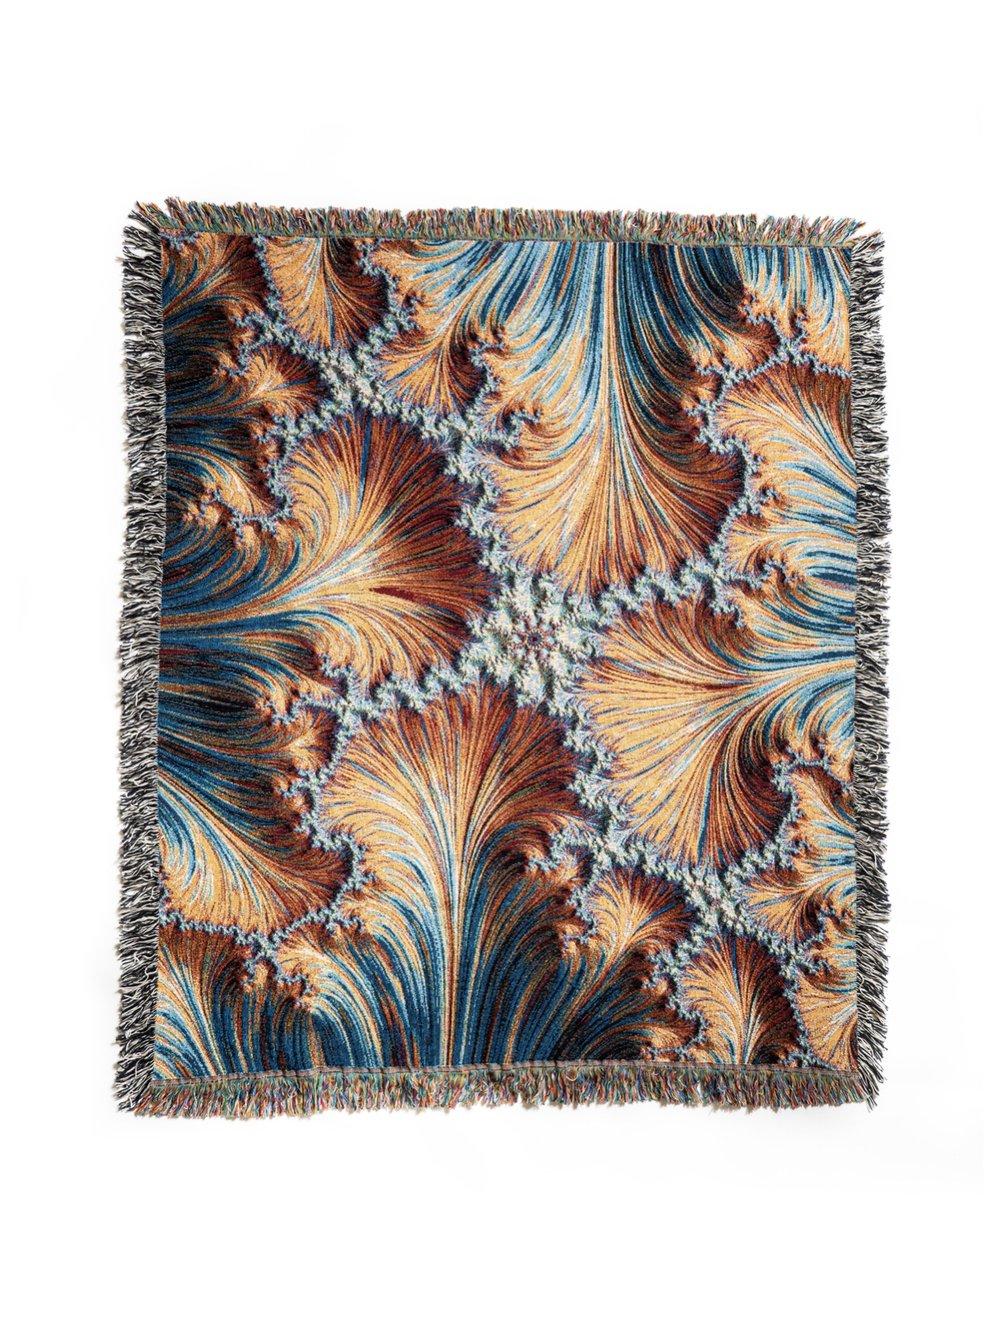 Woven Blanket #3